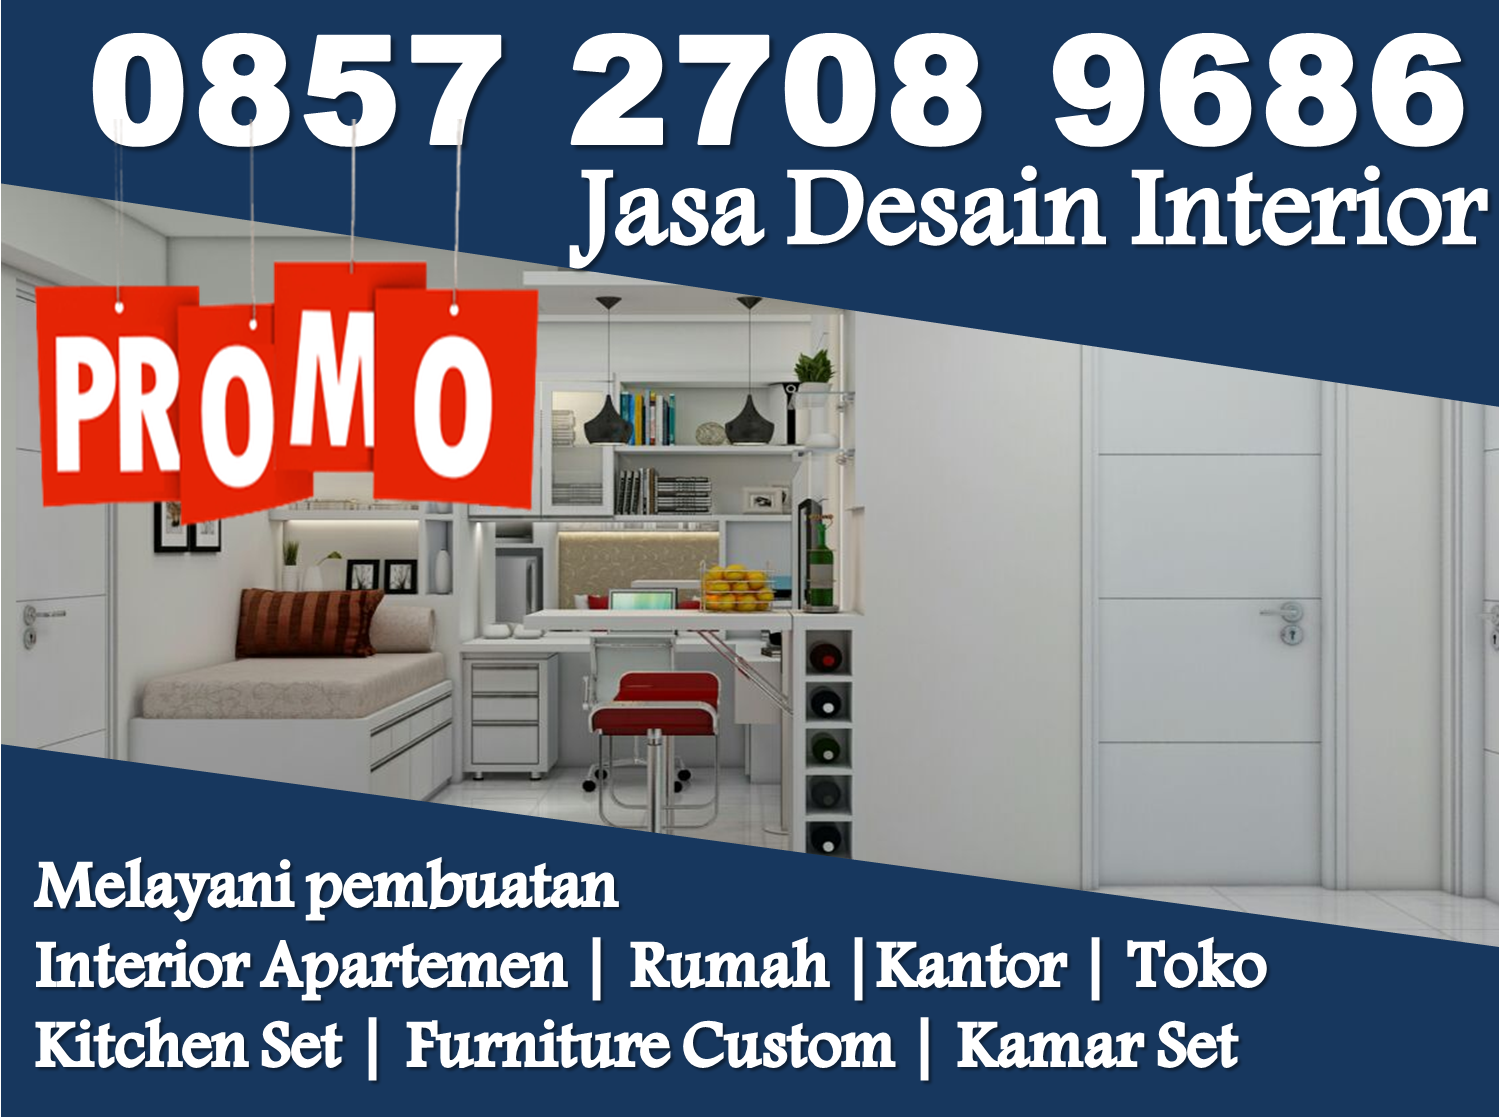 Telp Wa 0857 2708 9686 Hiasan Dapur Apartemen Kecil Untuk Middle